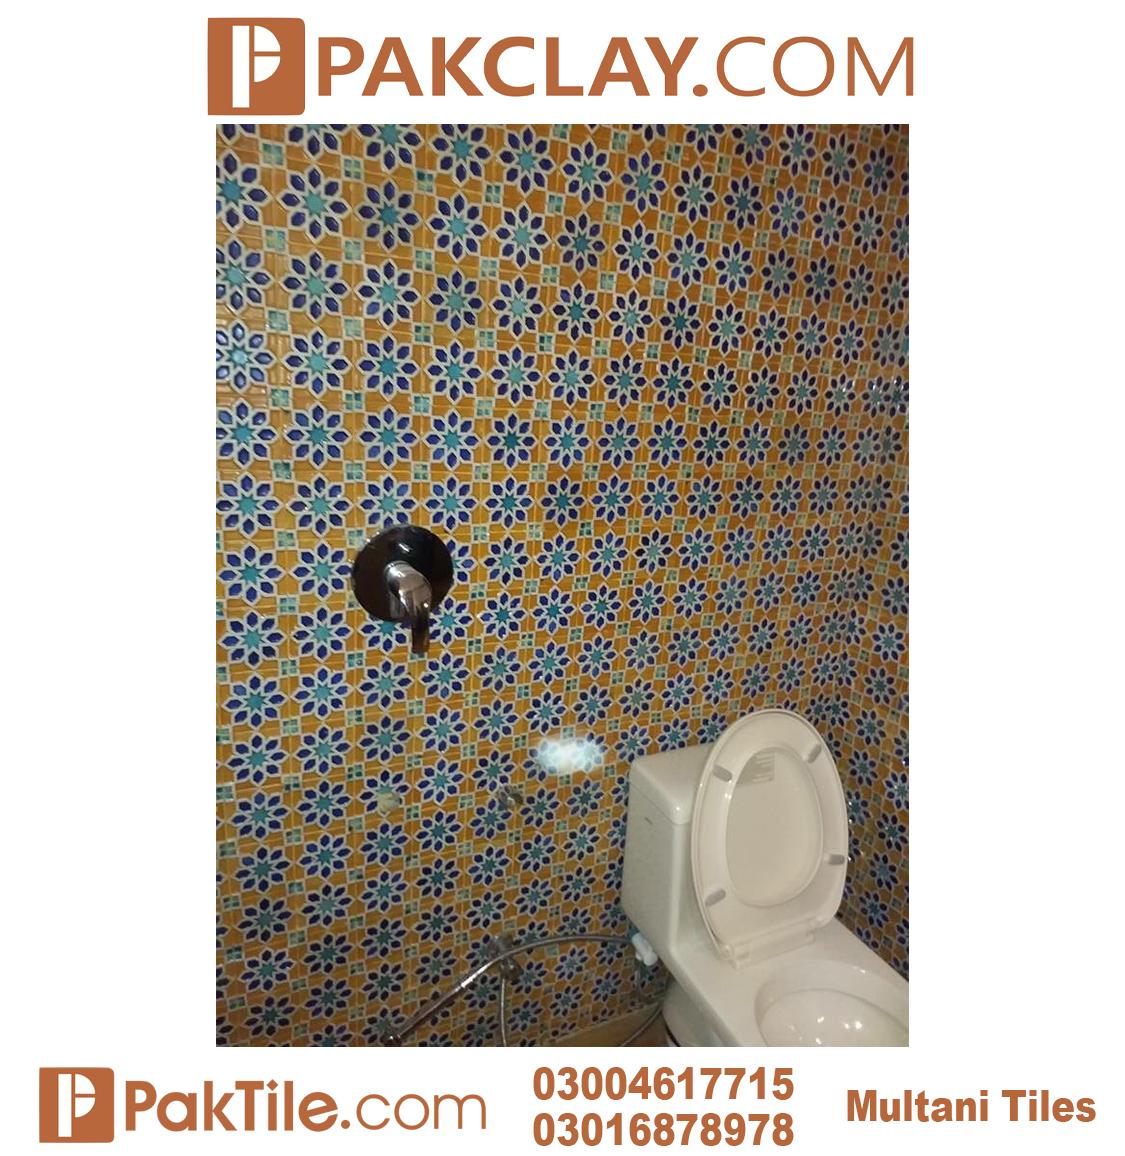 11 Pak Clay Multani Tiles in Lahore Bathroom Wall Tiles Design